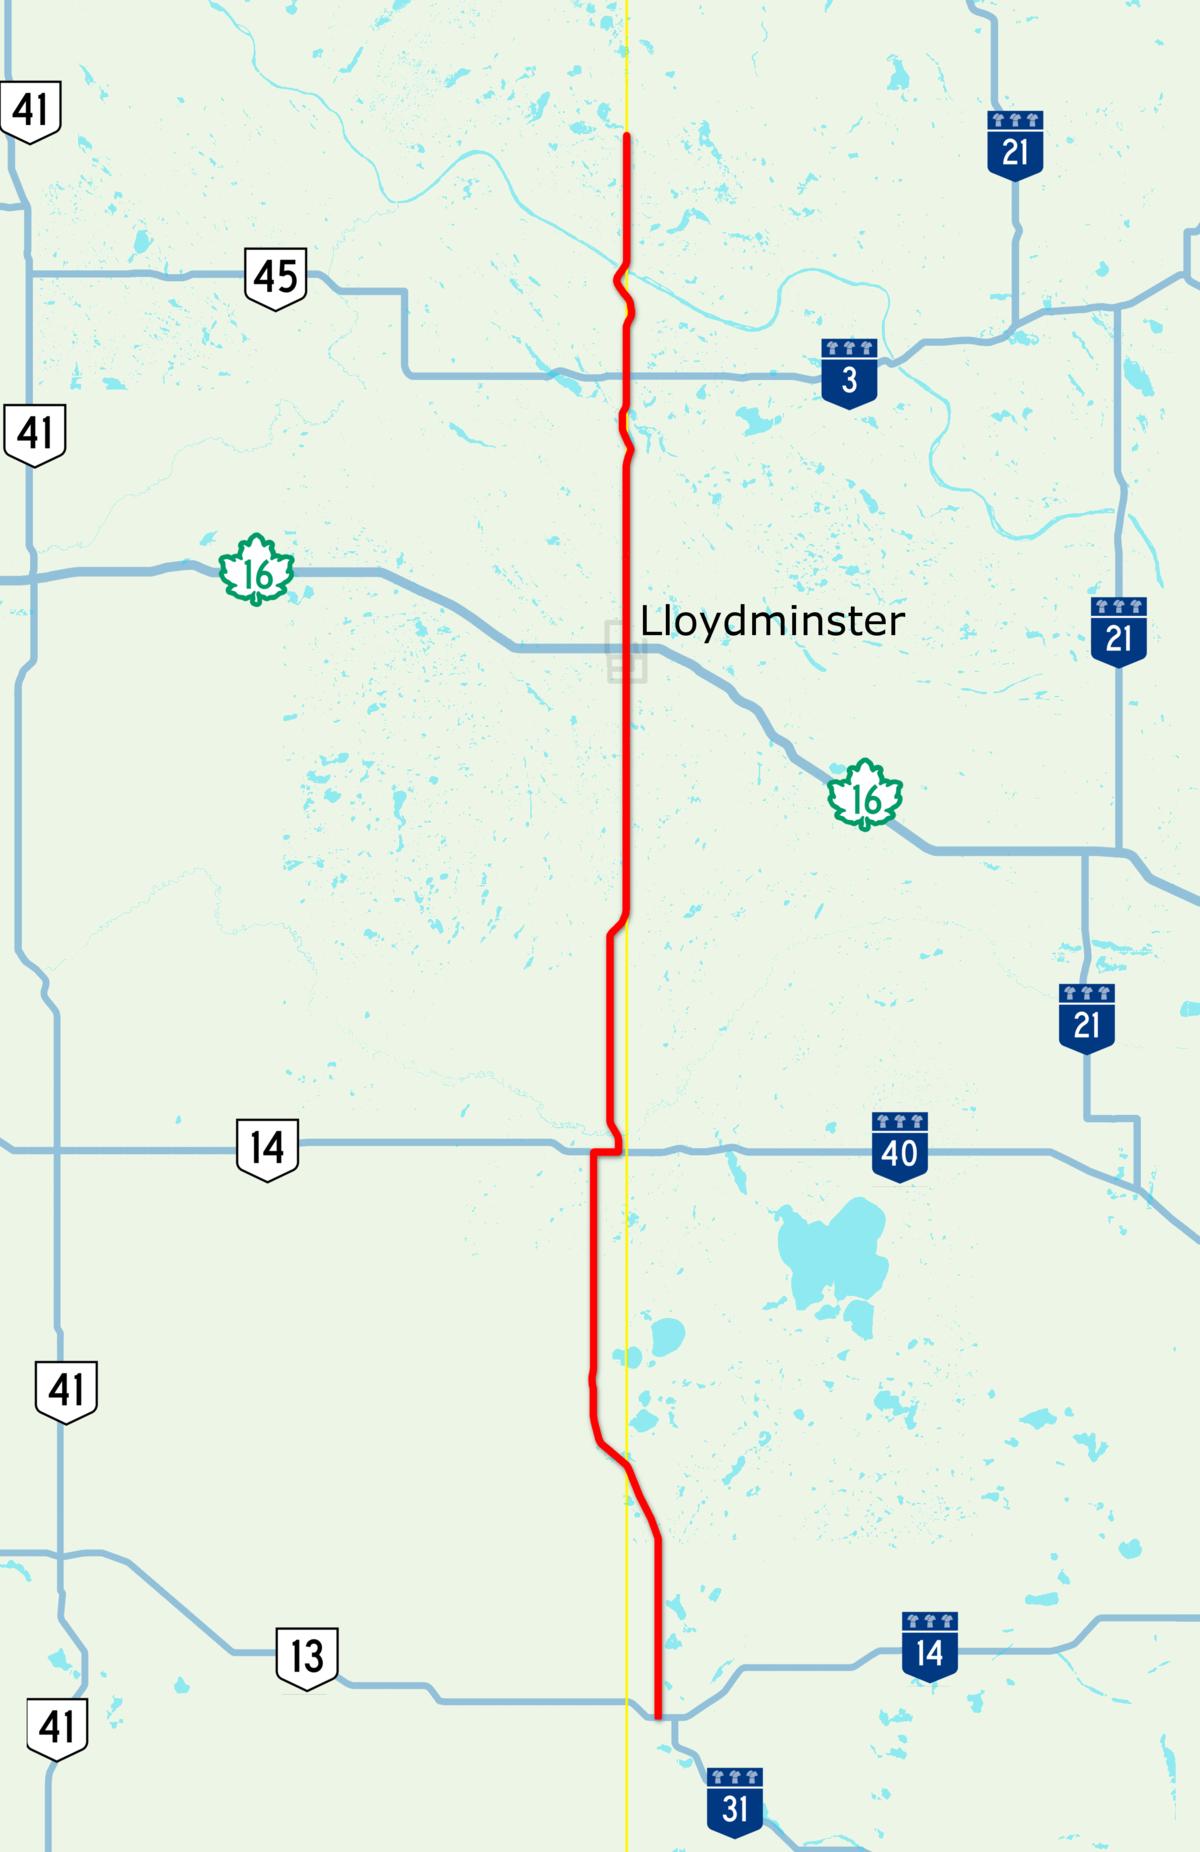 Highway 17 AlbertaSaskatchewan Wikipedia